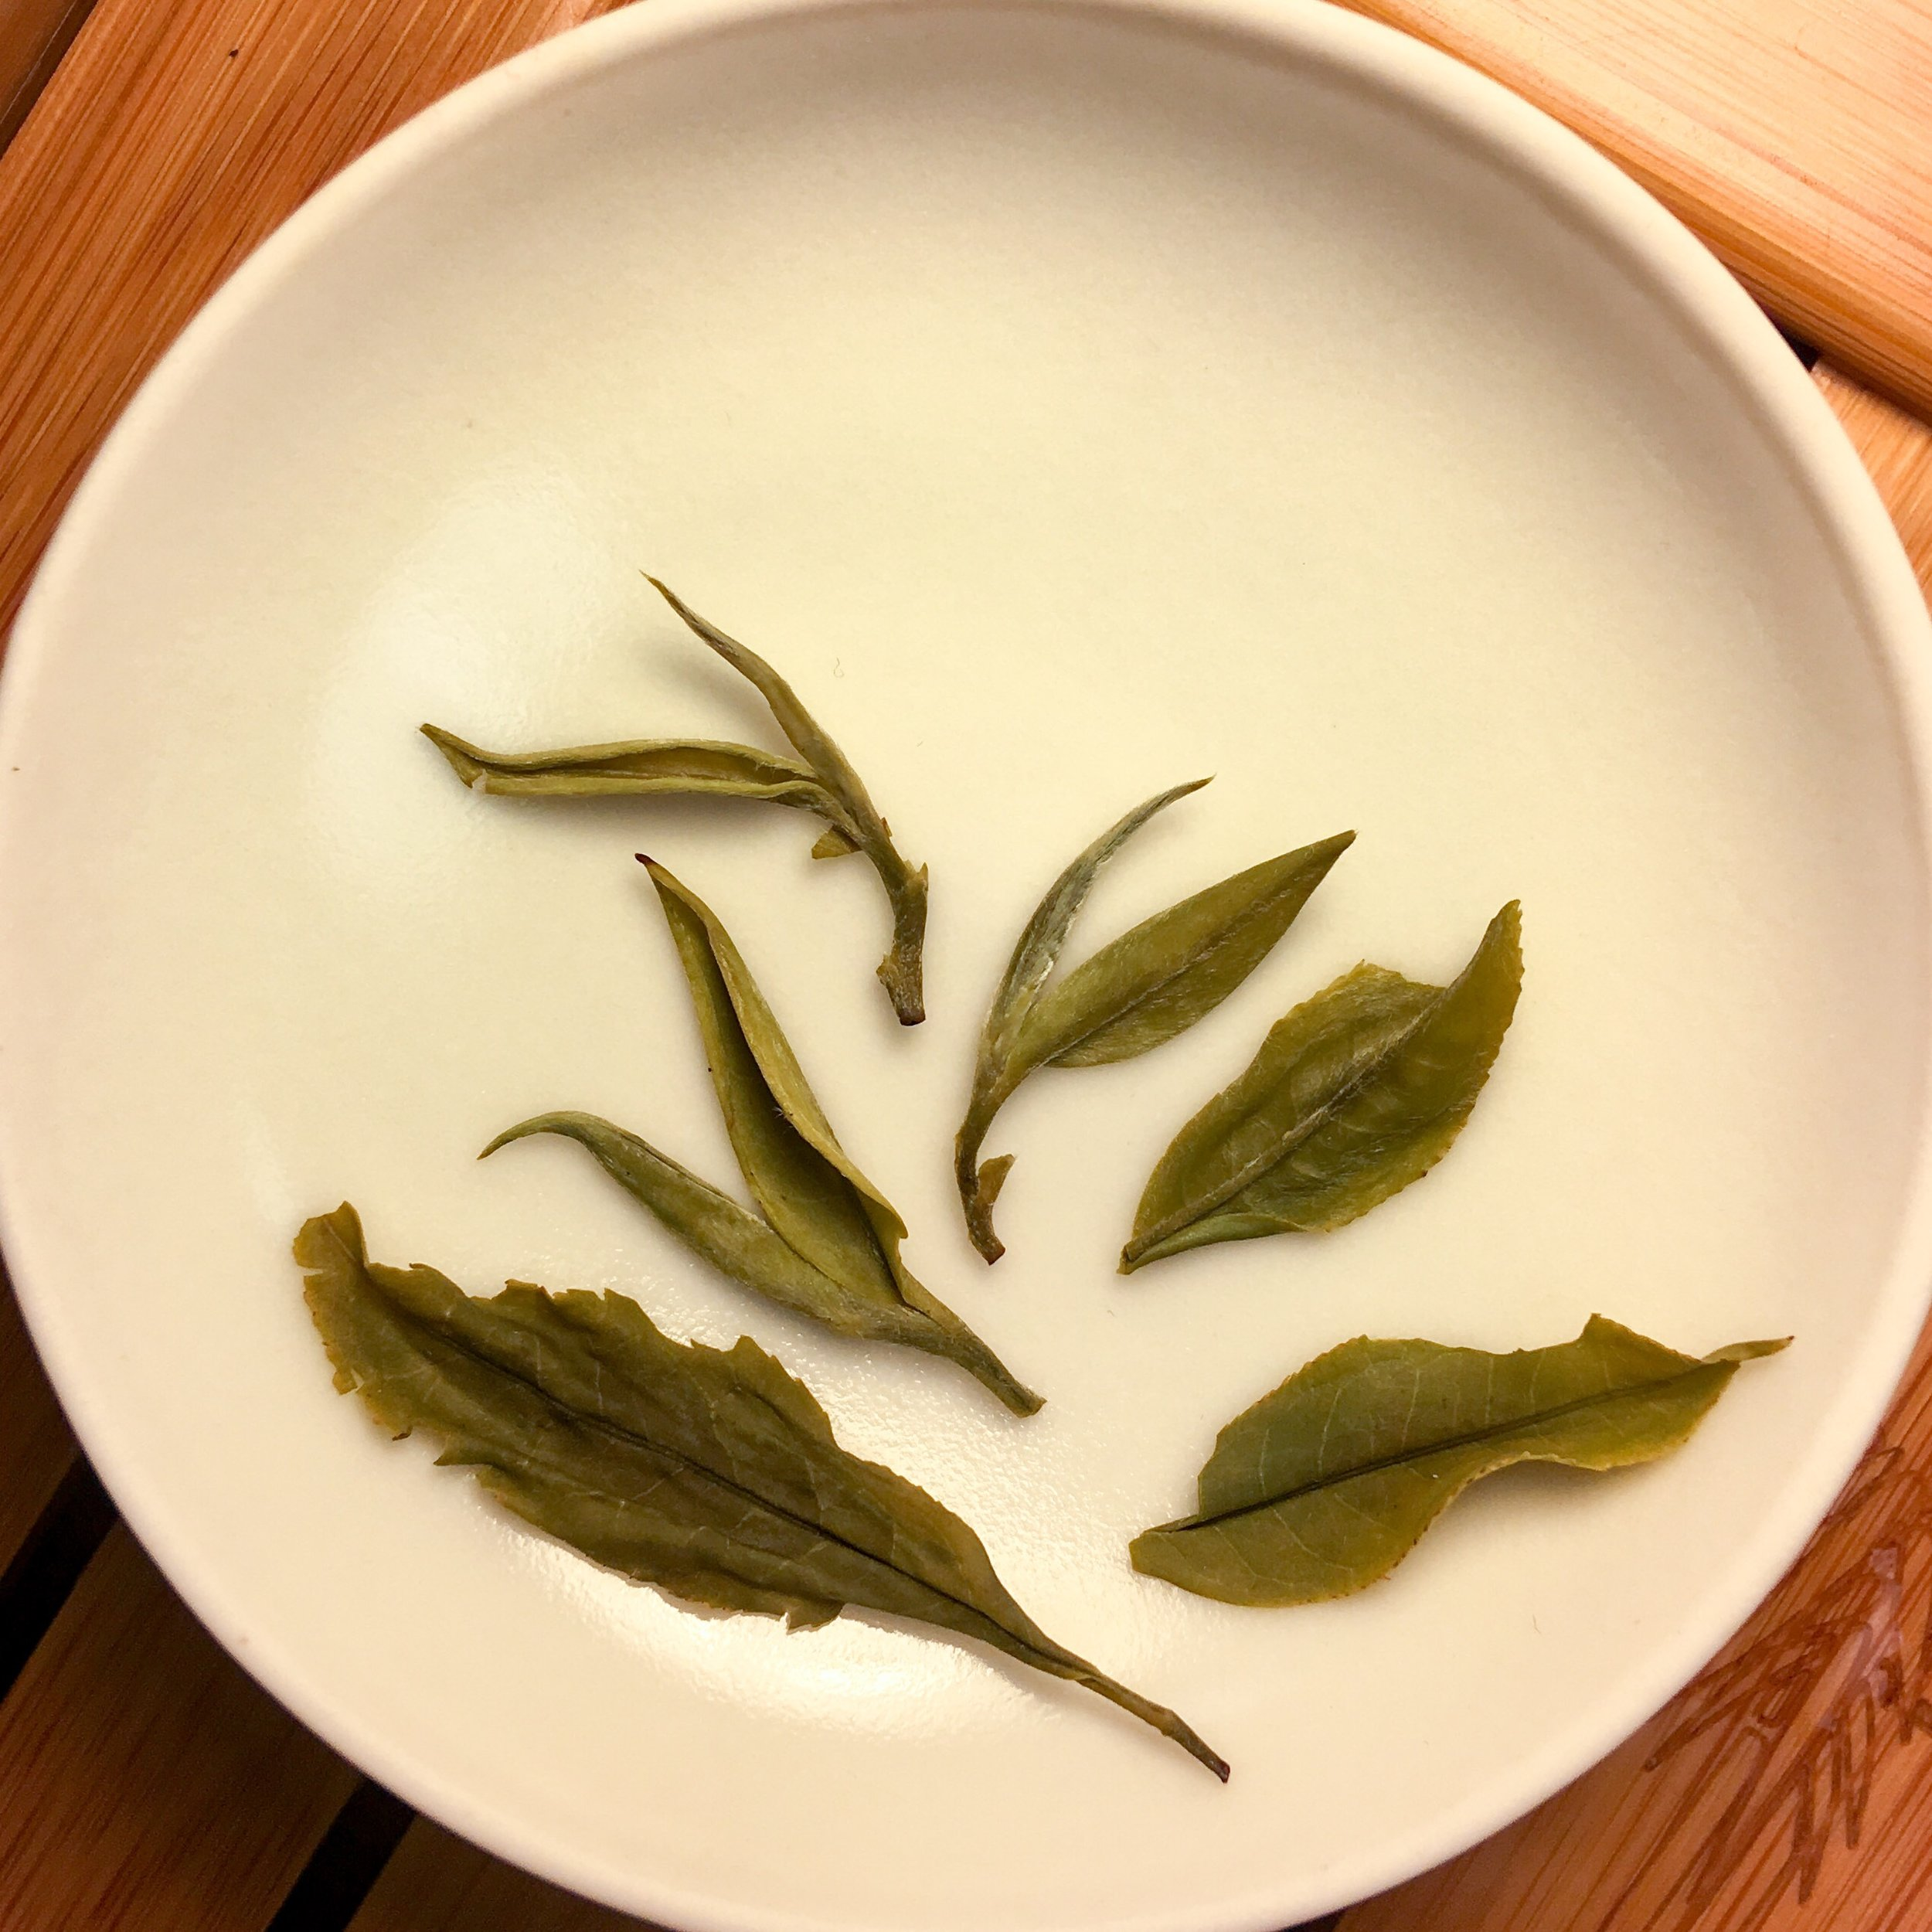 jade-spring-white-tea-nepal-nepalese-whole-leaf-loose-tea-itw2-2019a.JPEG